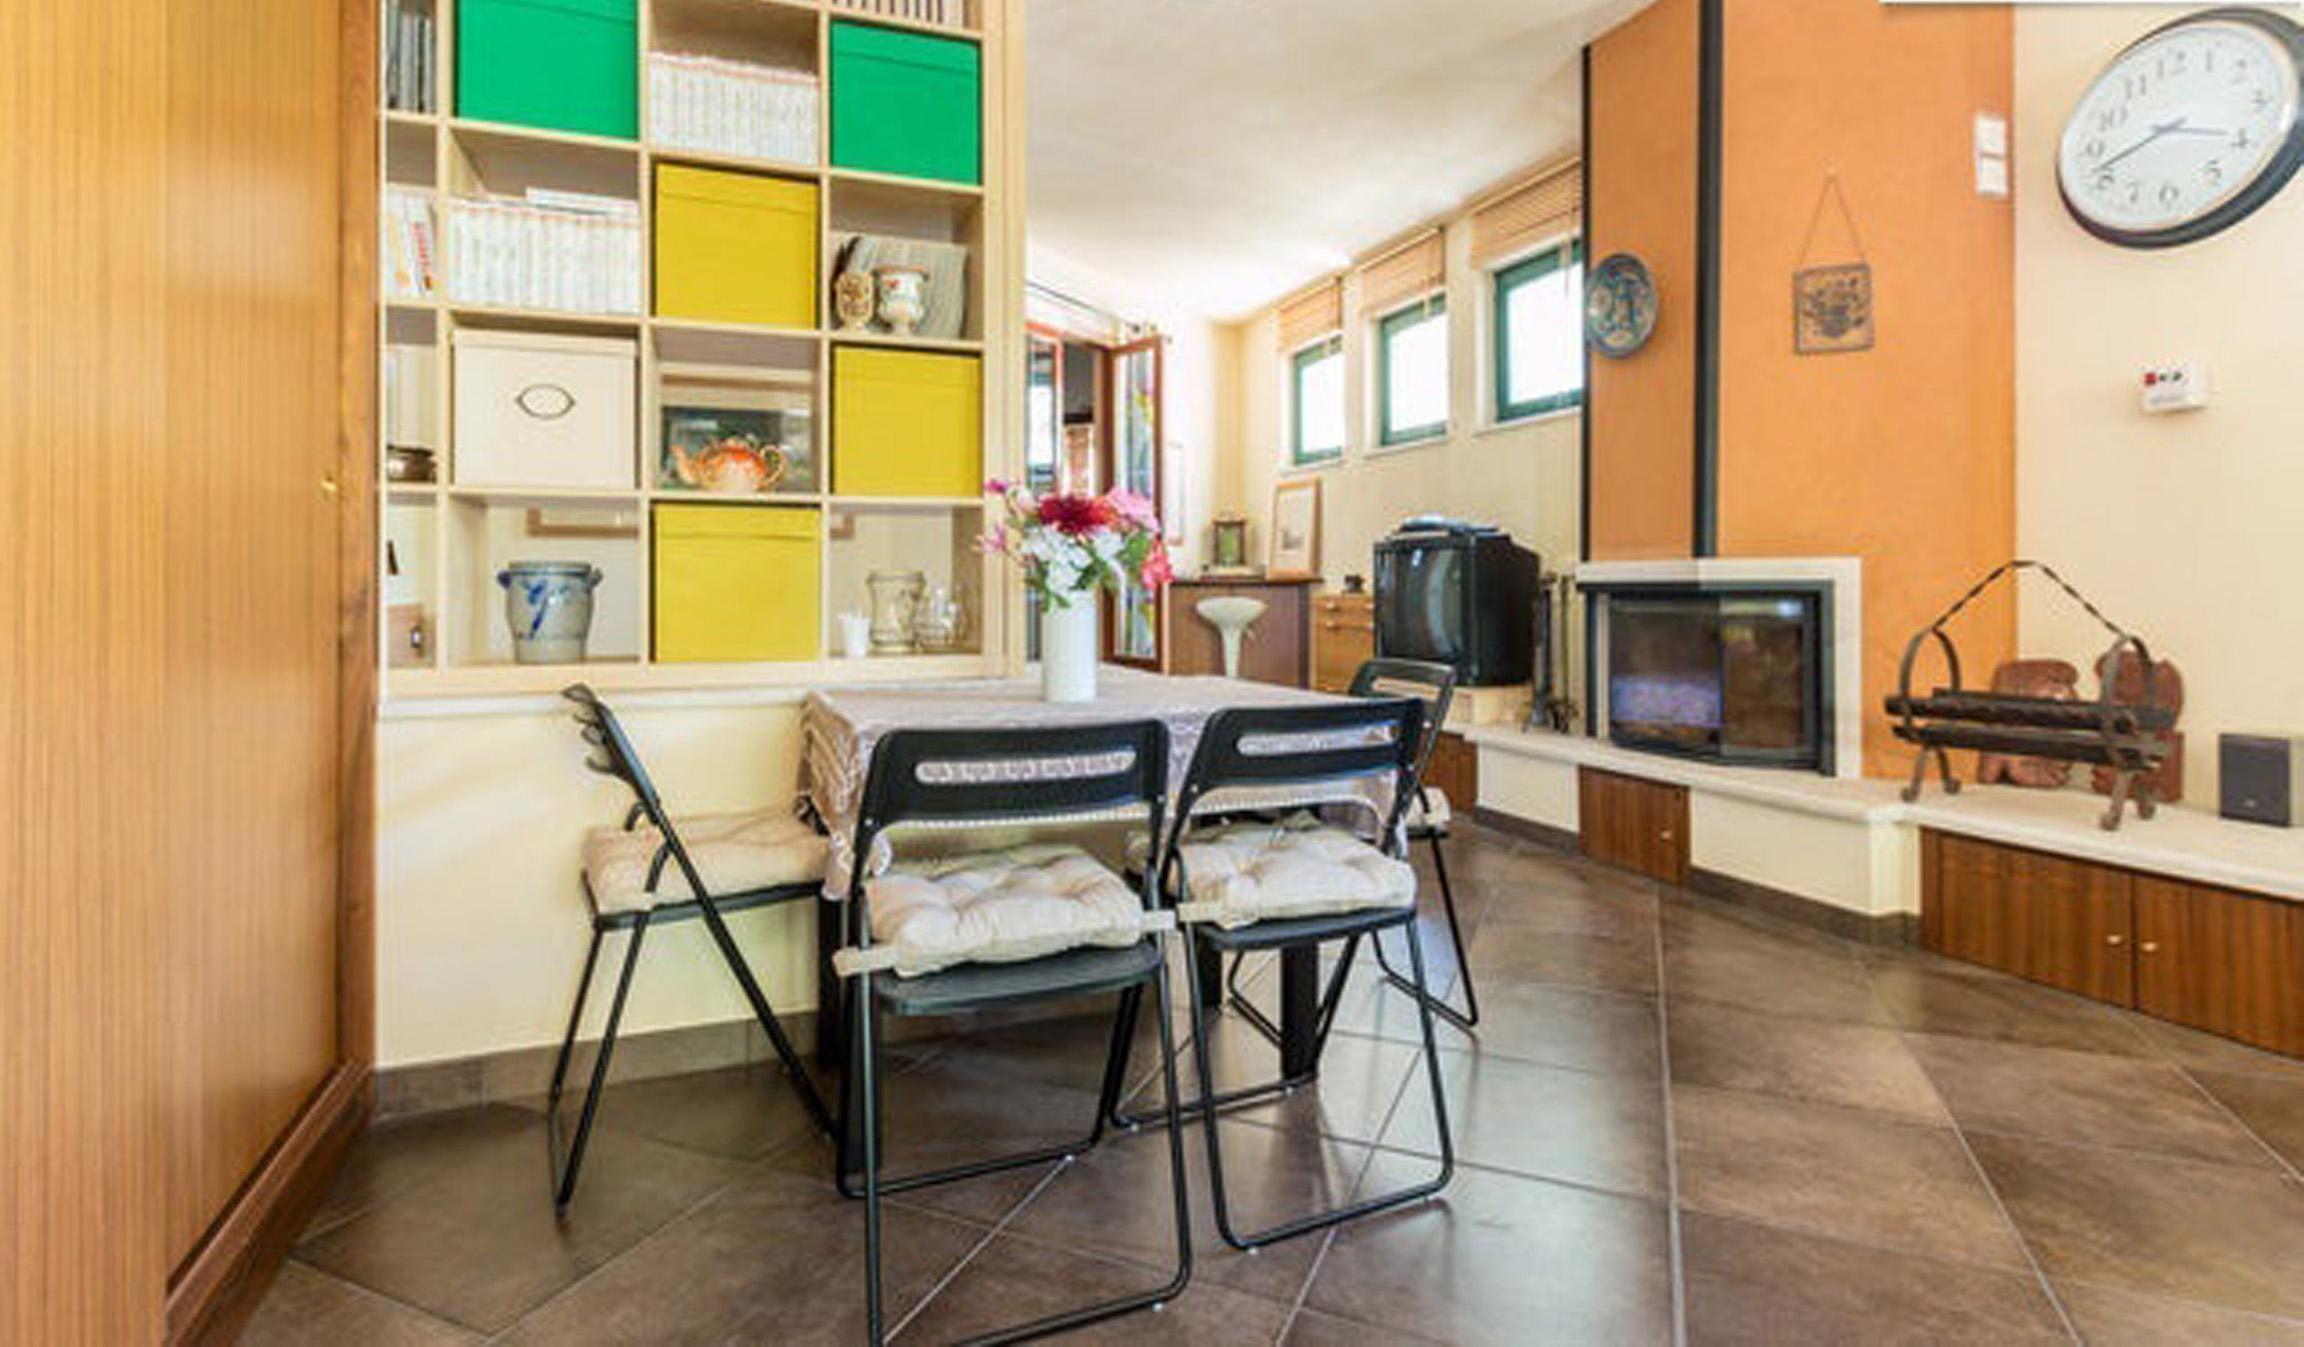 Appartement de vacances Carrubo (1730191), Modica, Ragusa, Sicile, Italie, image 8